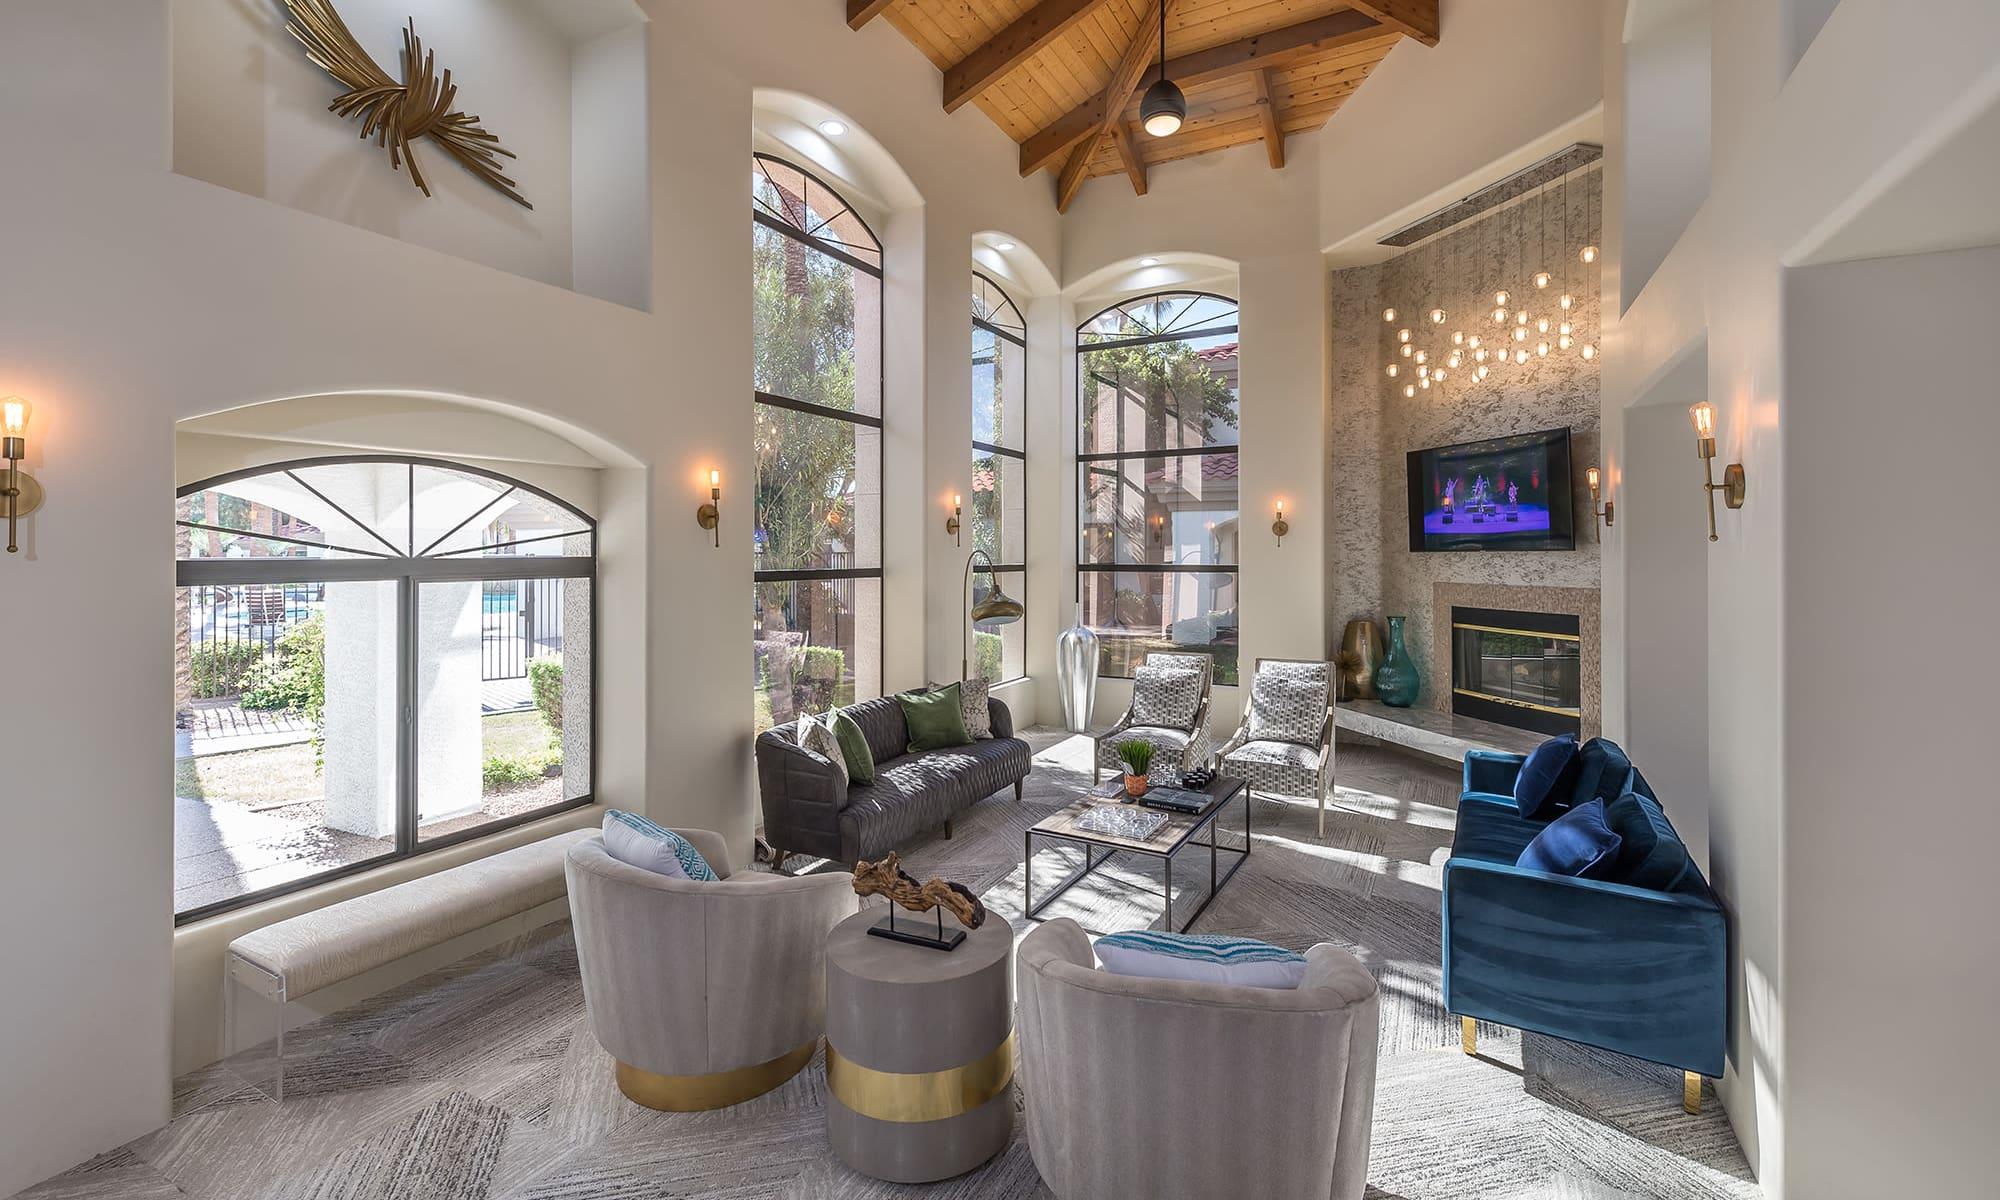 Apartments in Chandler, Arizona, at San Palmas